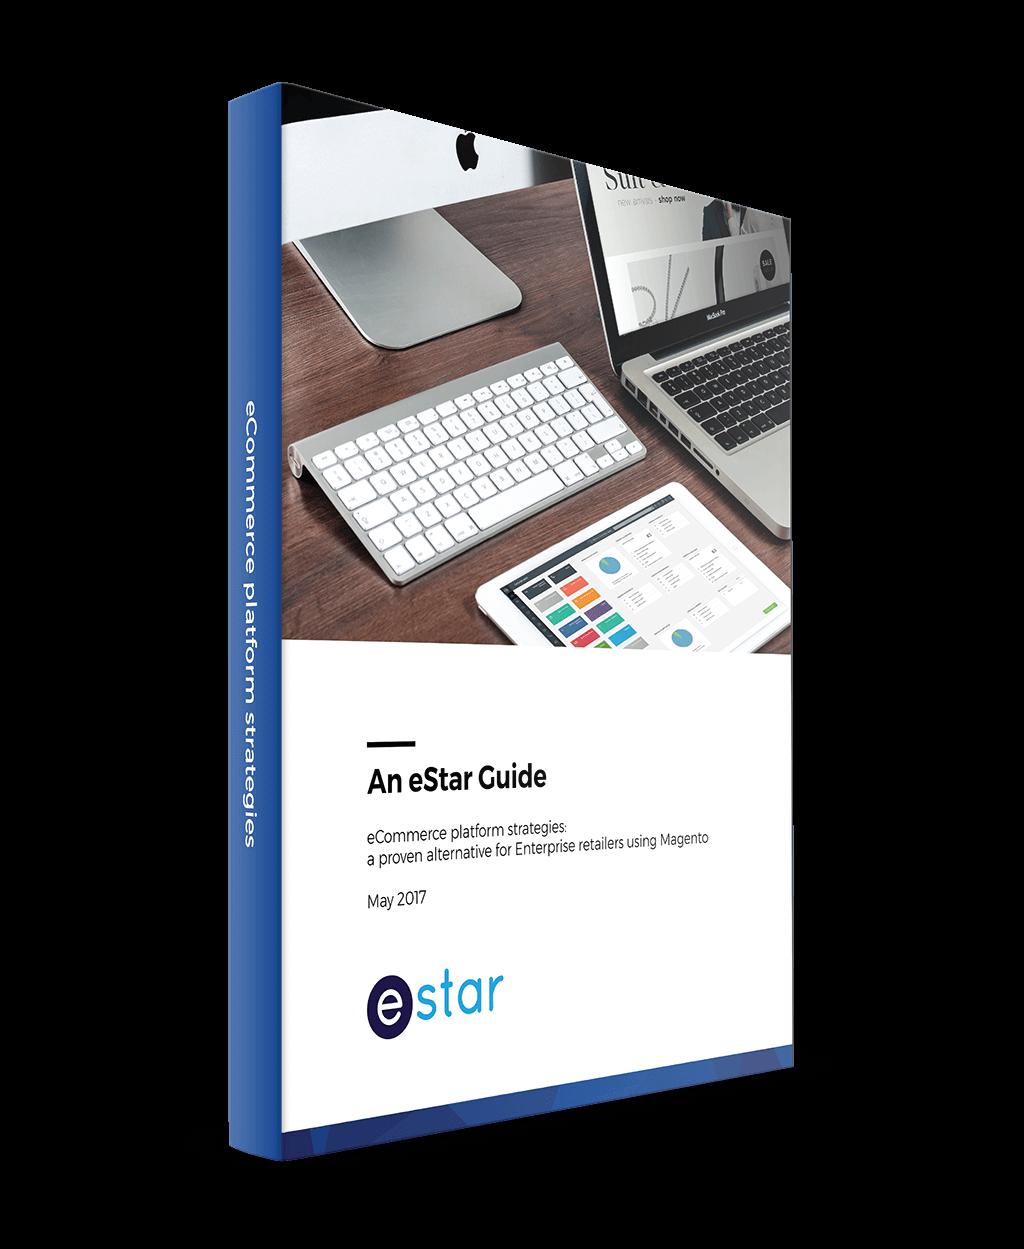 An_eStar_Guide-eCommerce_platform_strategies.png